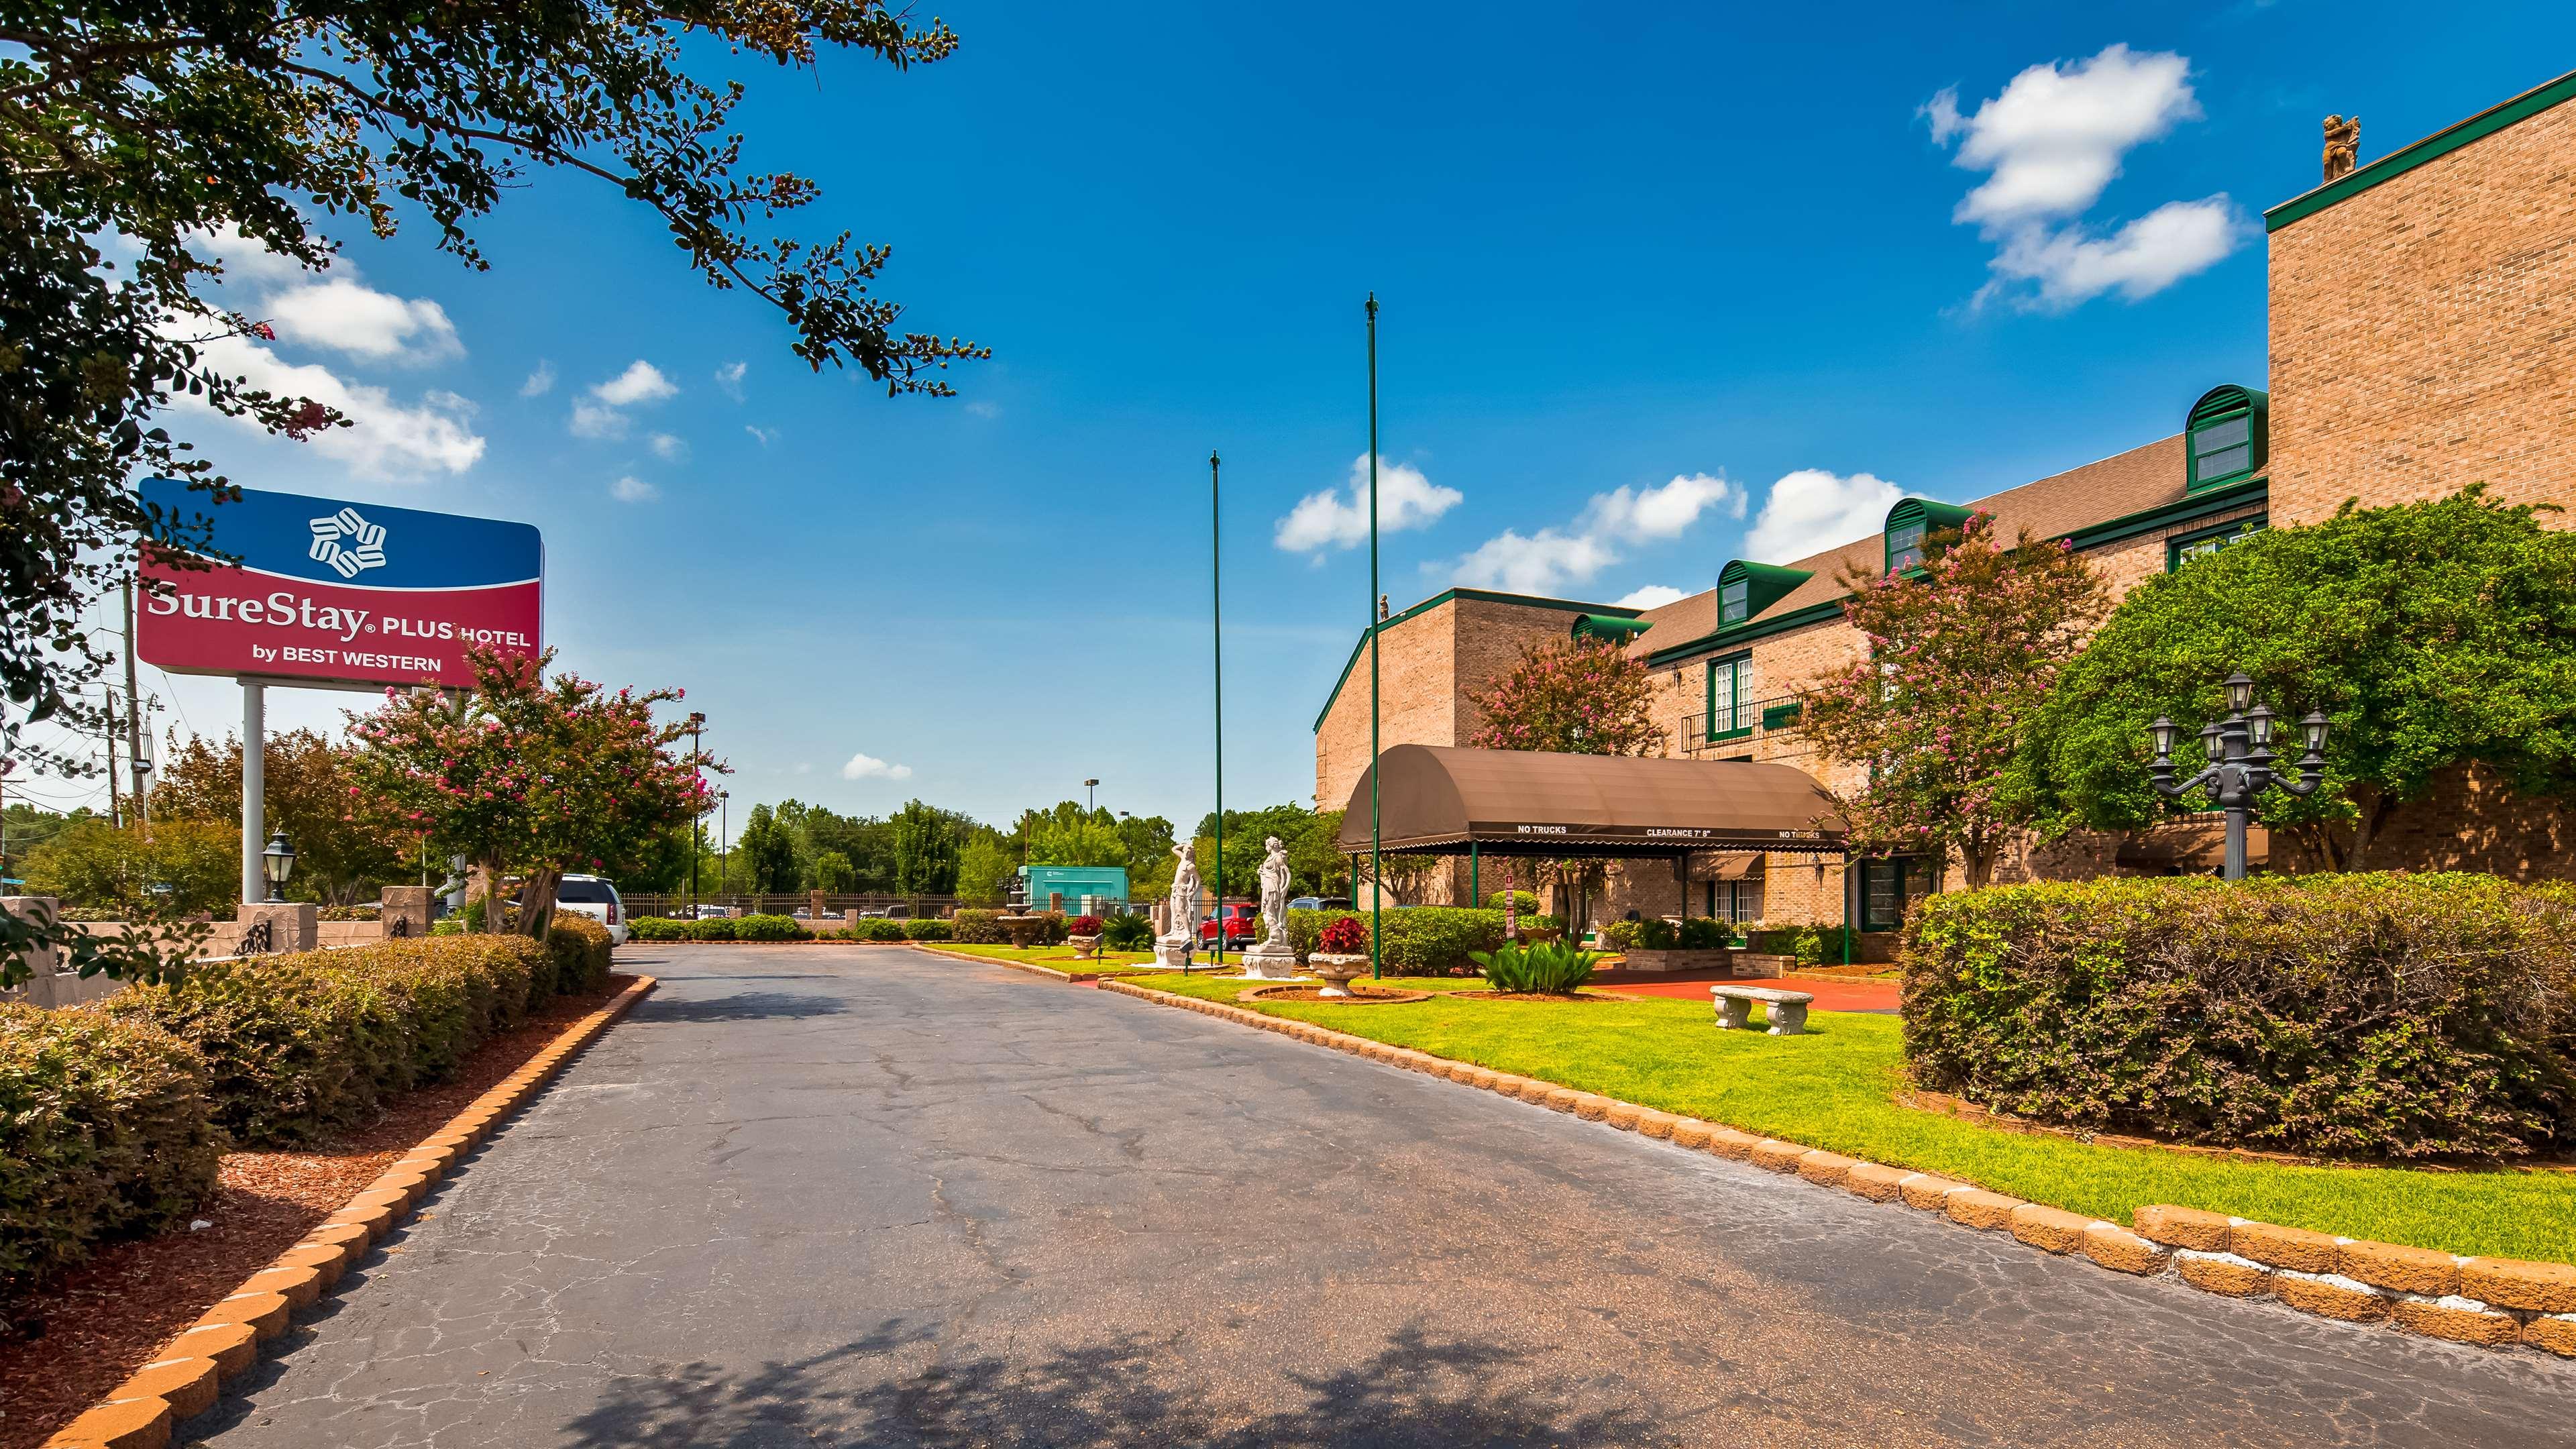 SureStay Plus Hotel by Best Western Baton Rouge image 0